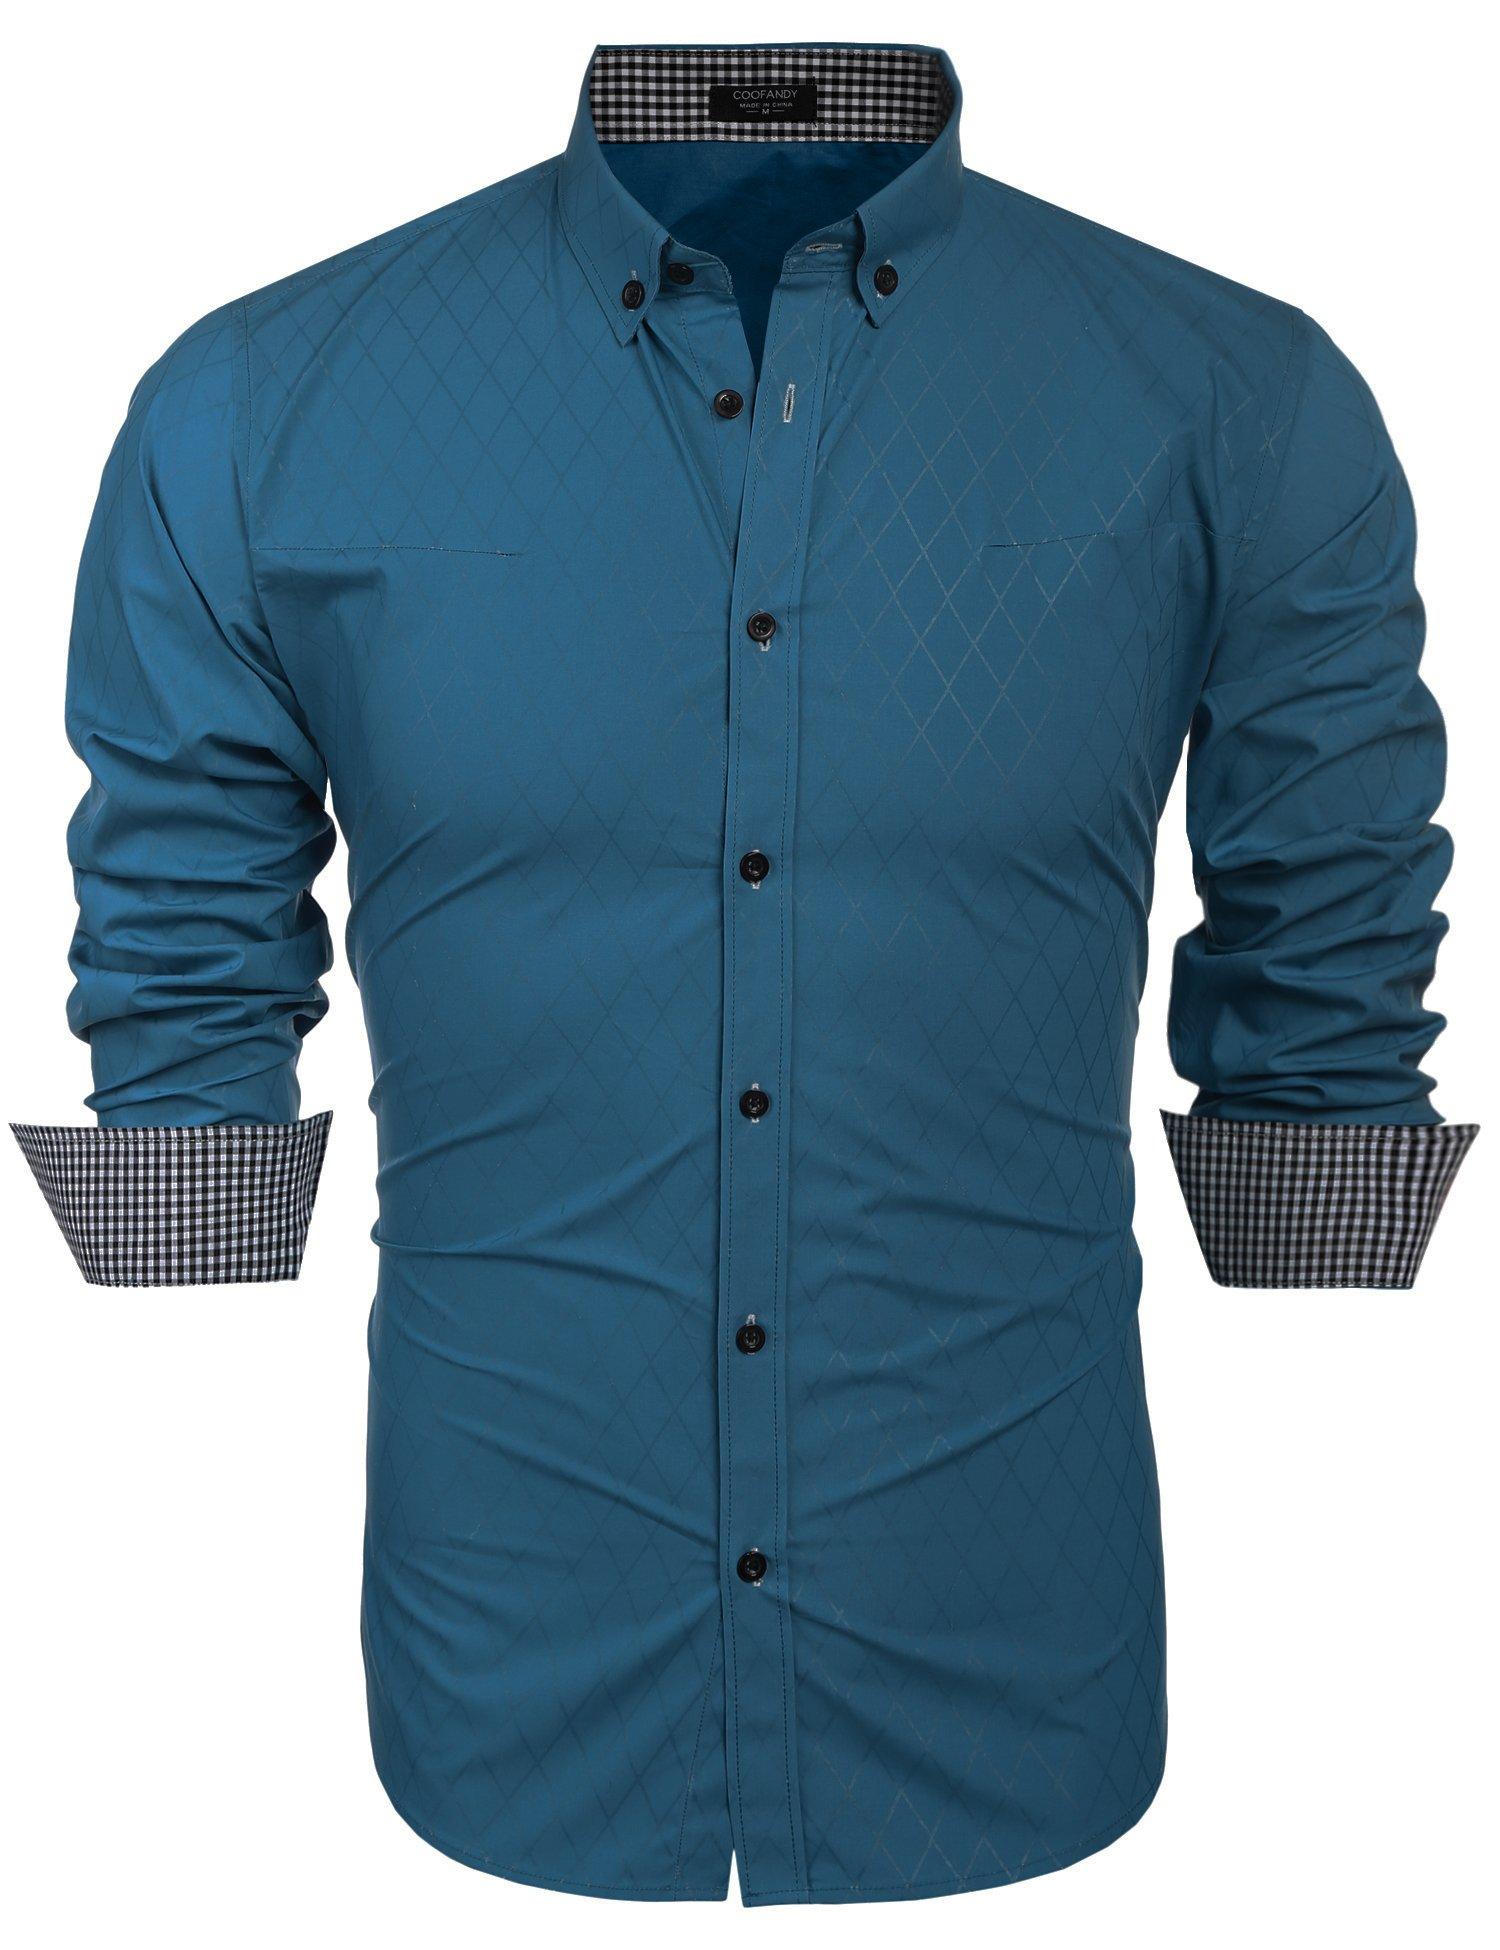 COOFANDY Men's Business Stylish Slim Fit Long Sleeve Casual Dress Shirt, Acid Blue, Small